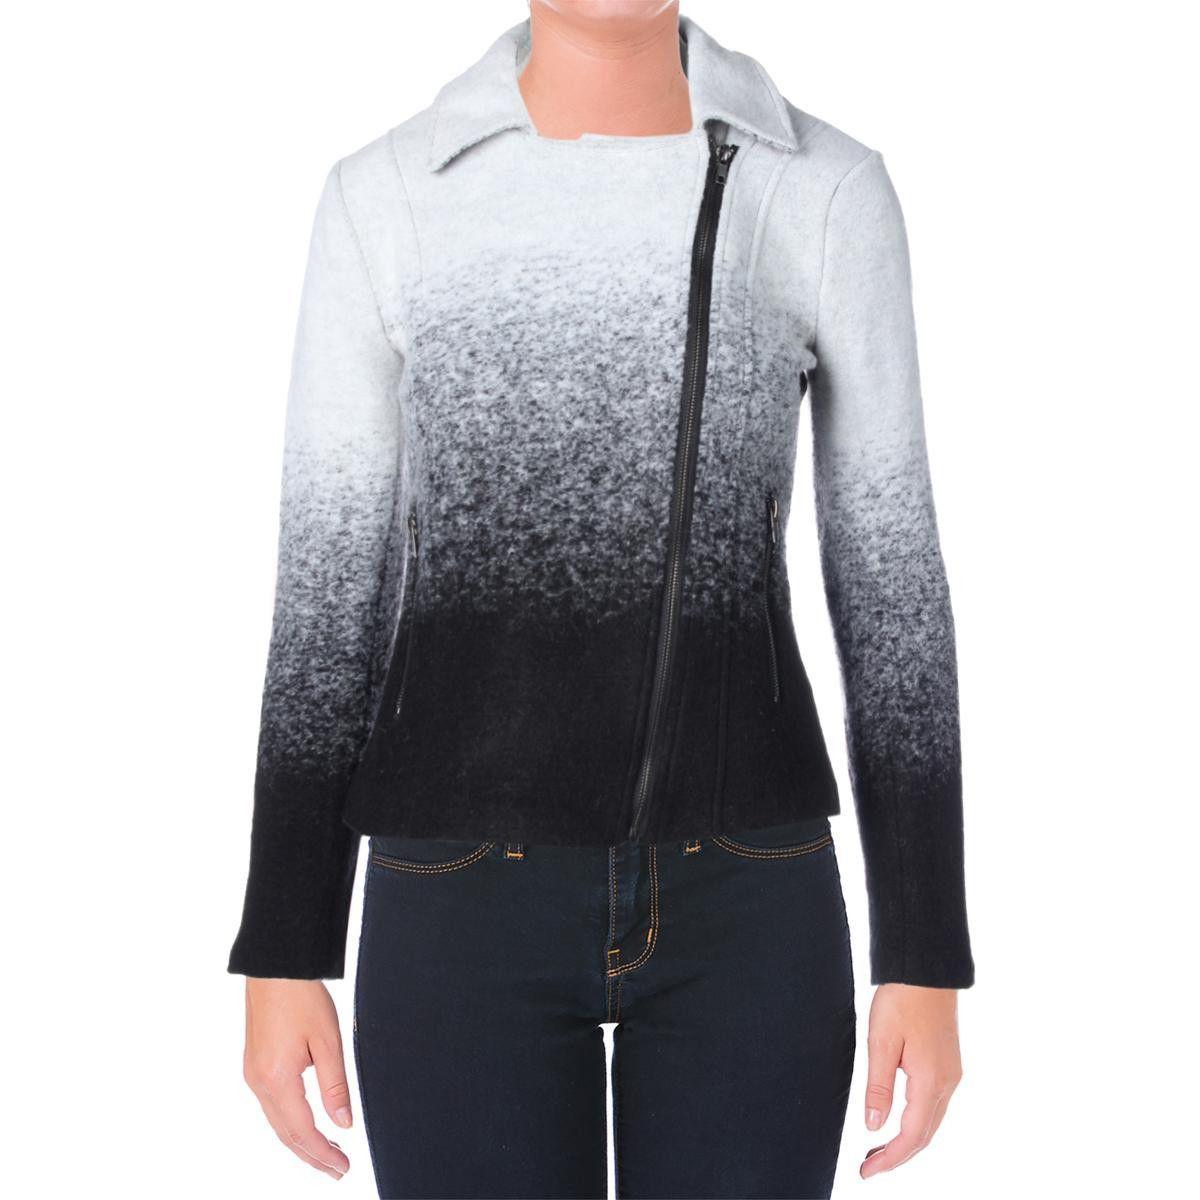 BB Dakota Womens Wool Blend Ombre Motorcycle Jacket